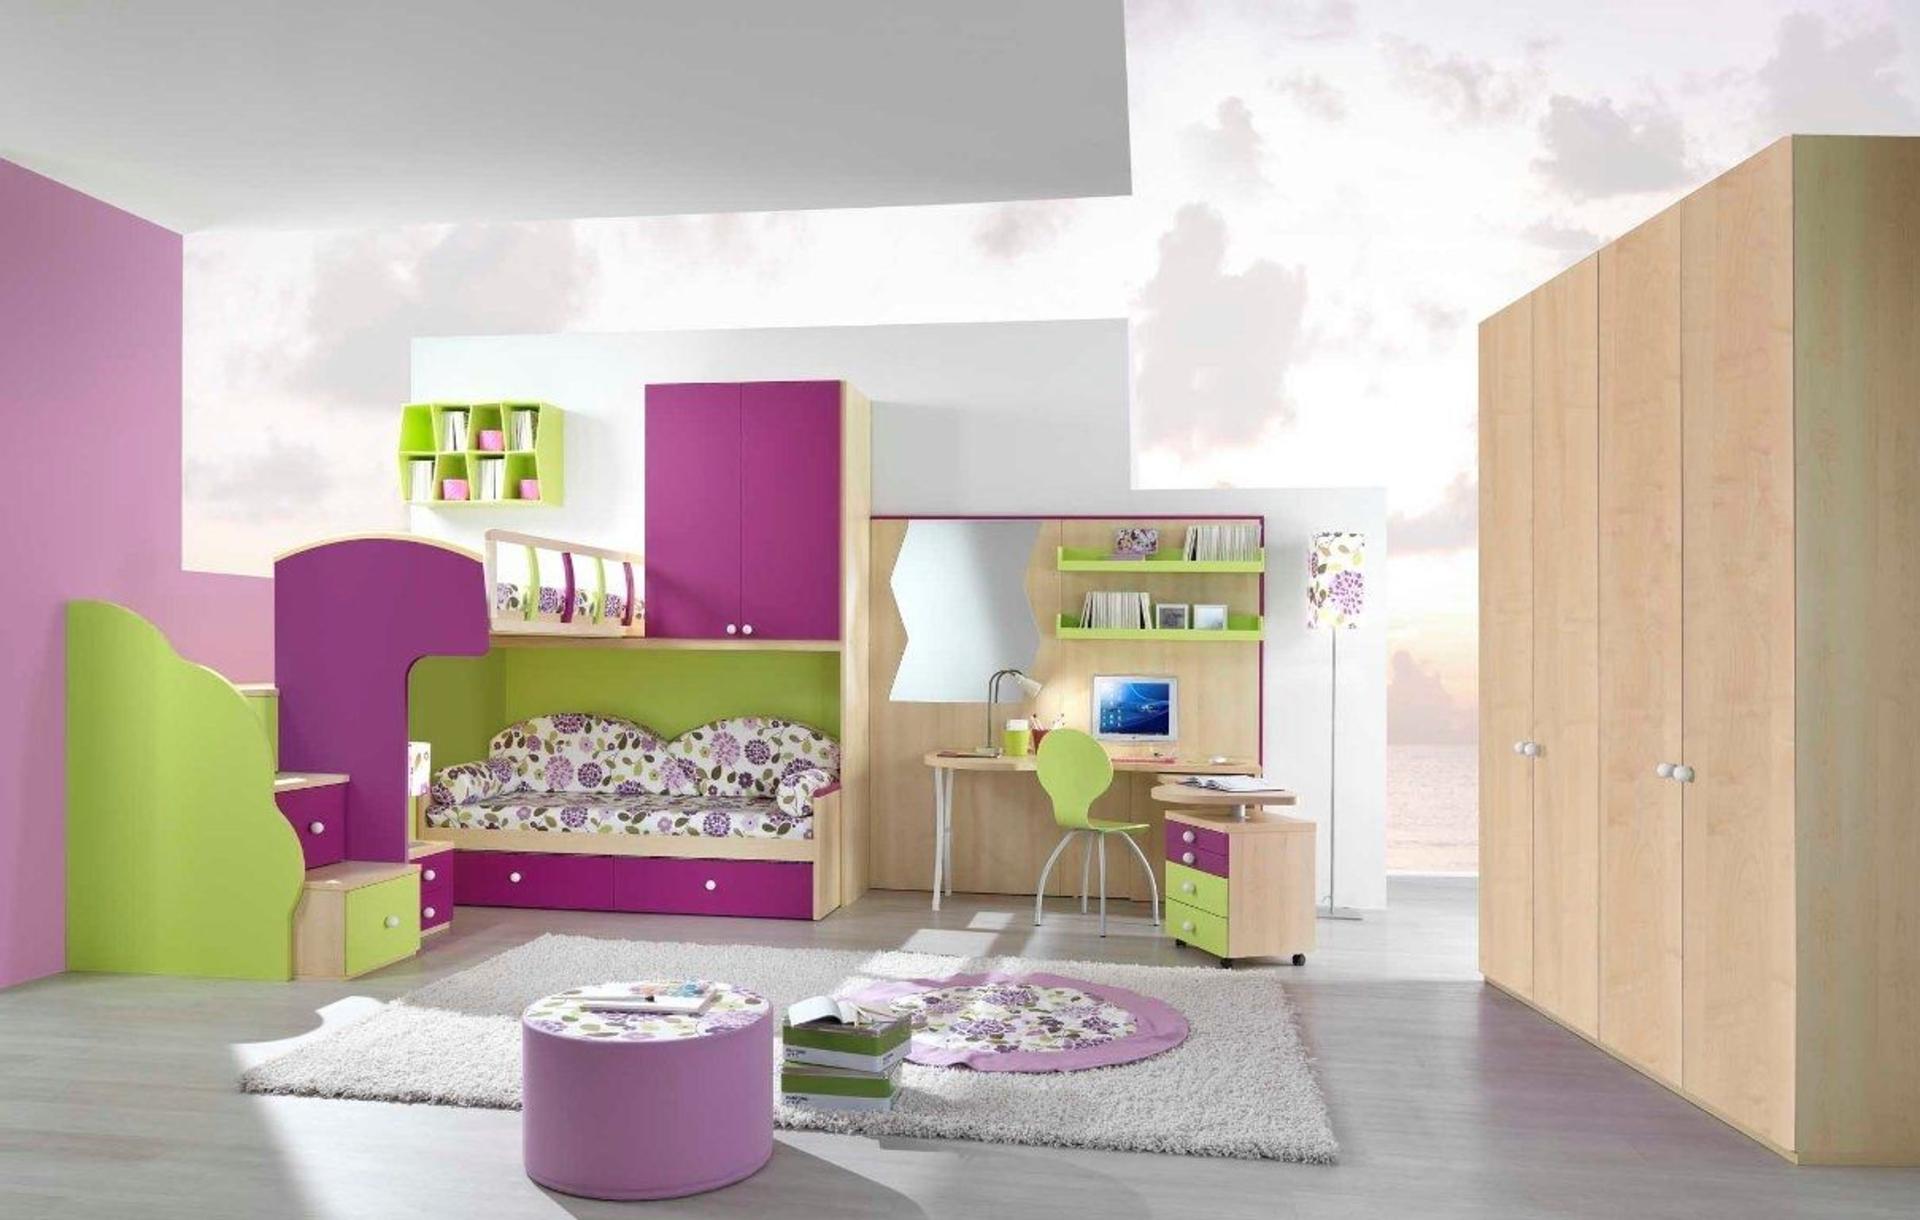 بالصور غرف نوم اطفال بنات , صور غرف نوم اطفال بنات جديدة و جميلة 3989 6